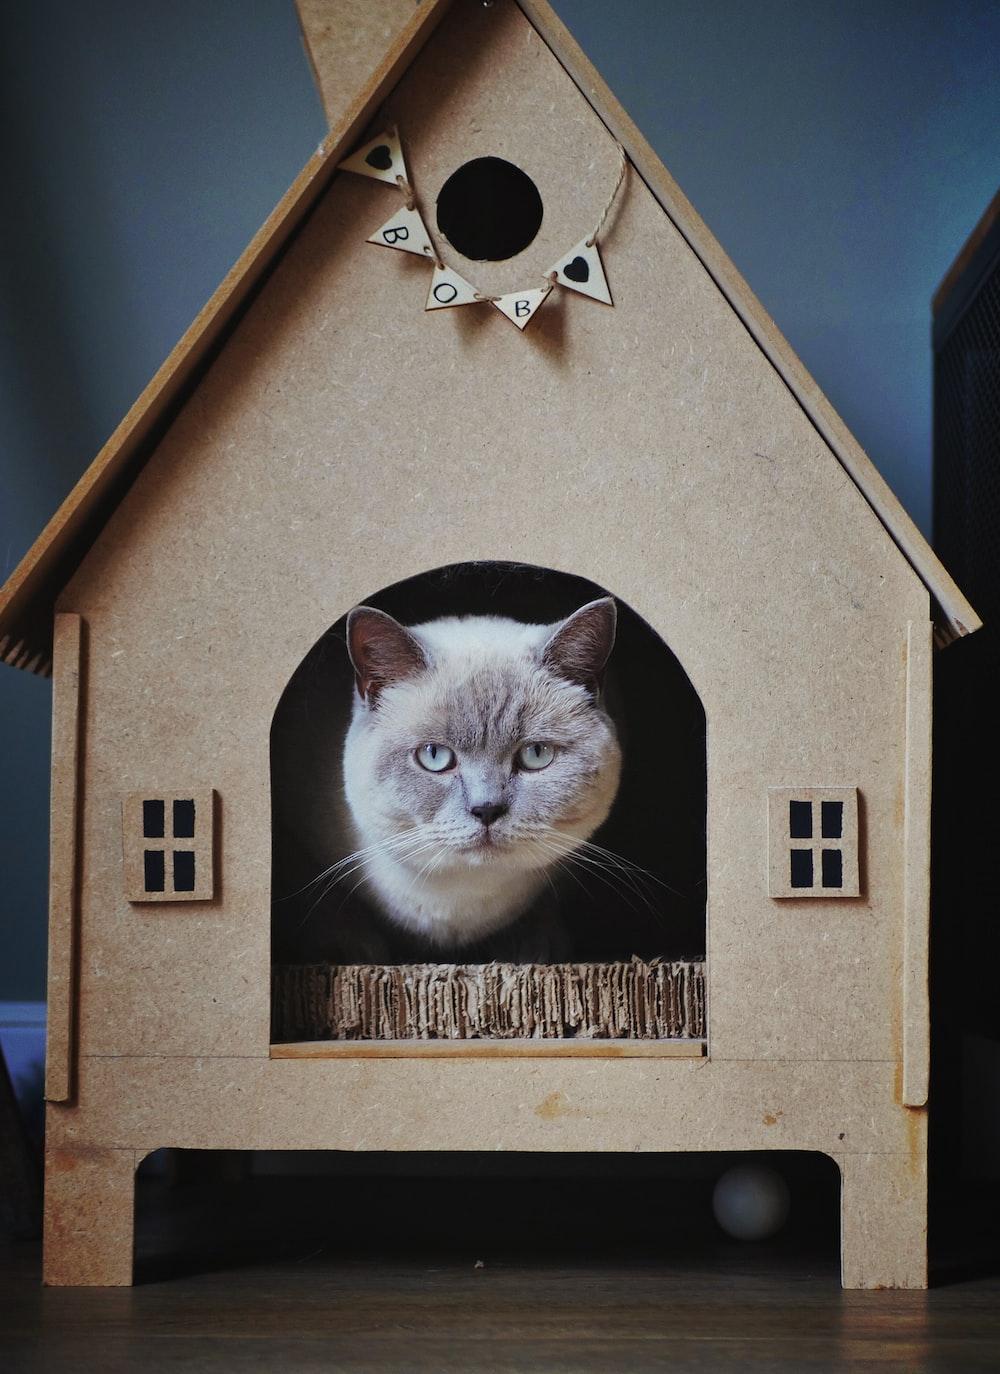 short-furred white cat on cat house